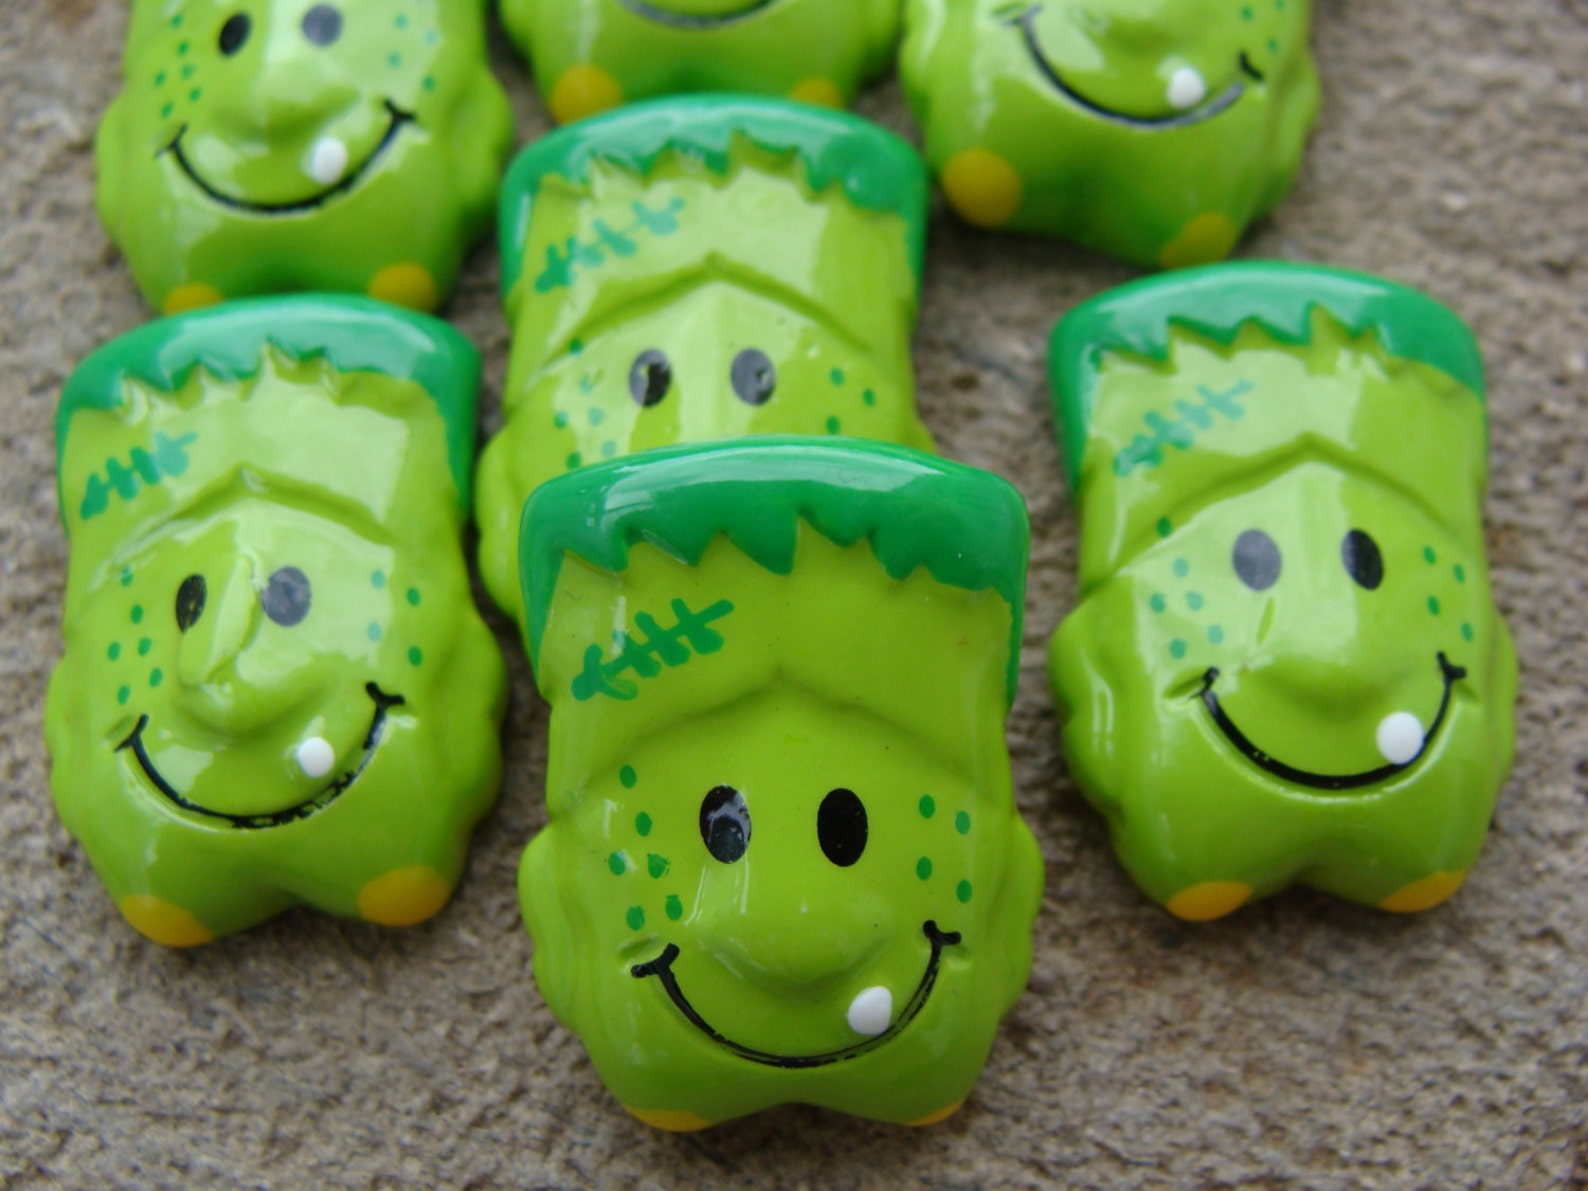 resin flatback planar resin,Frankenstein resins bride of Frankenstein cabochons Halloween resins Halloween flatbacks cabochons